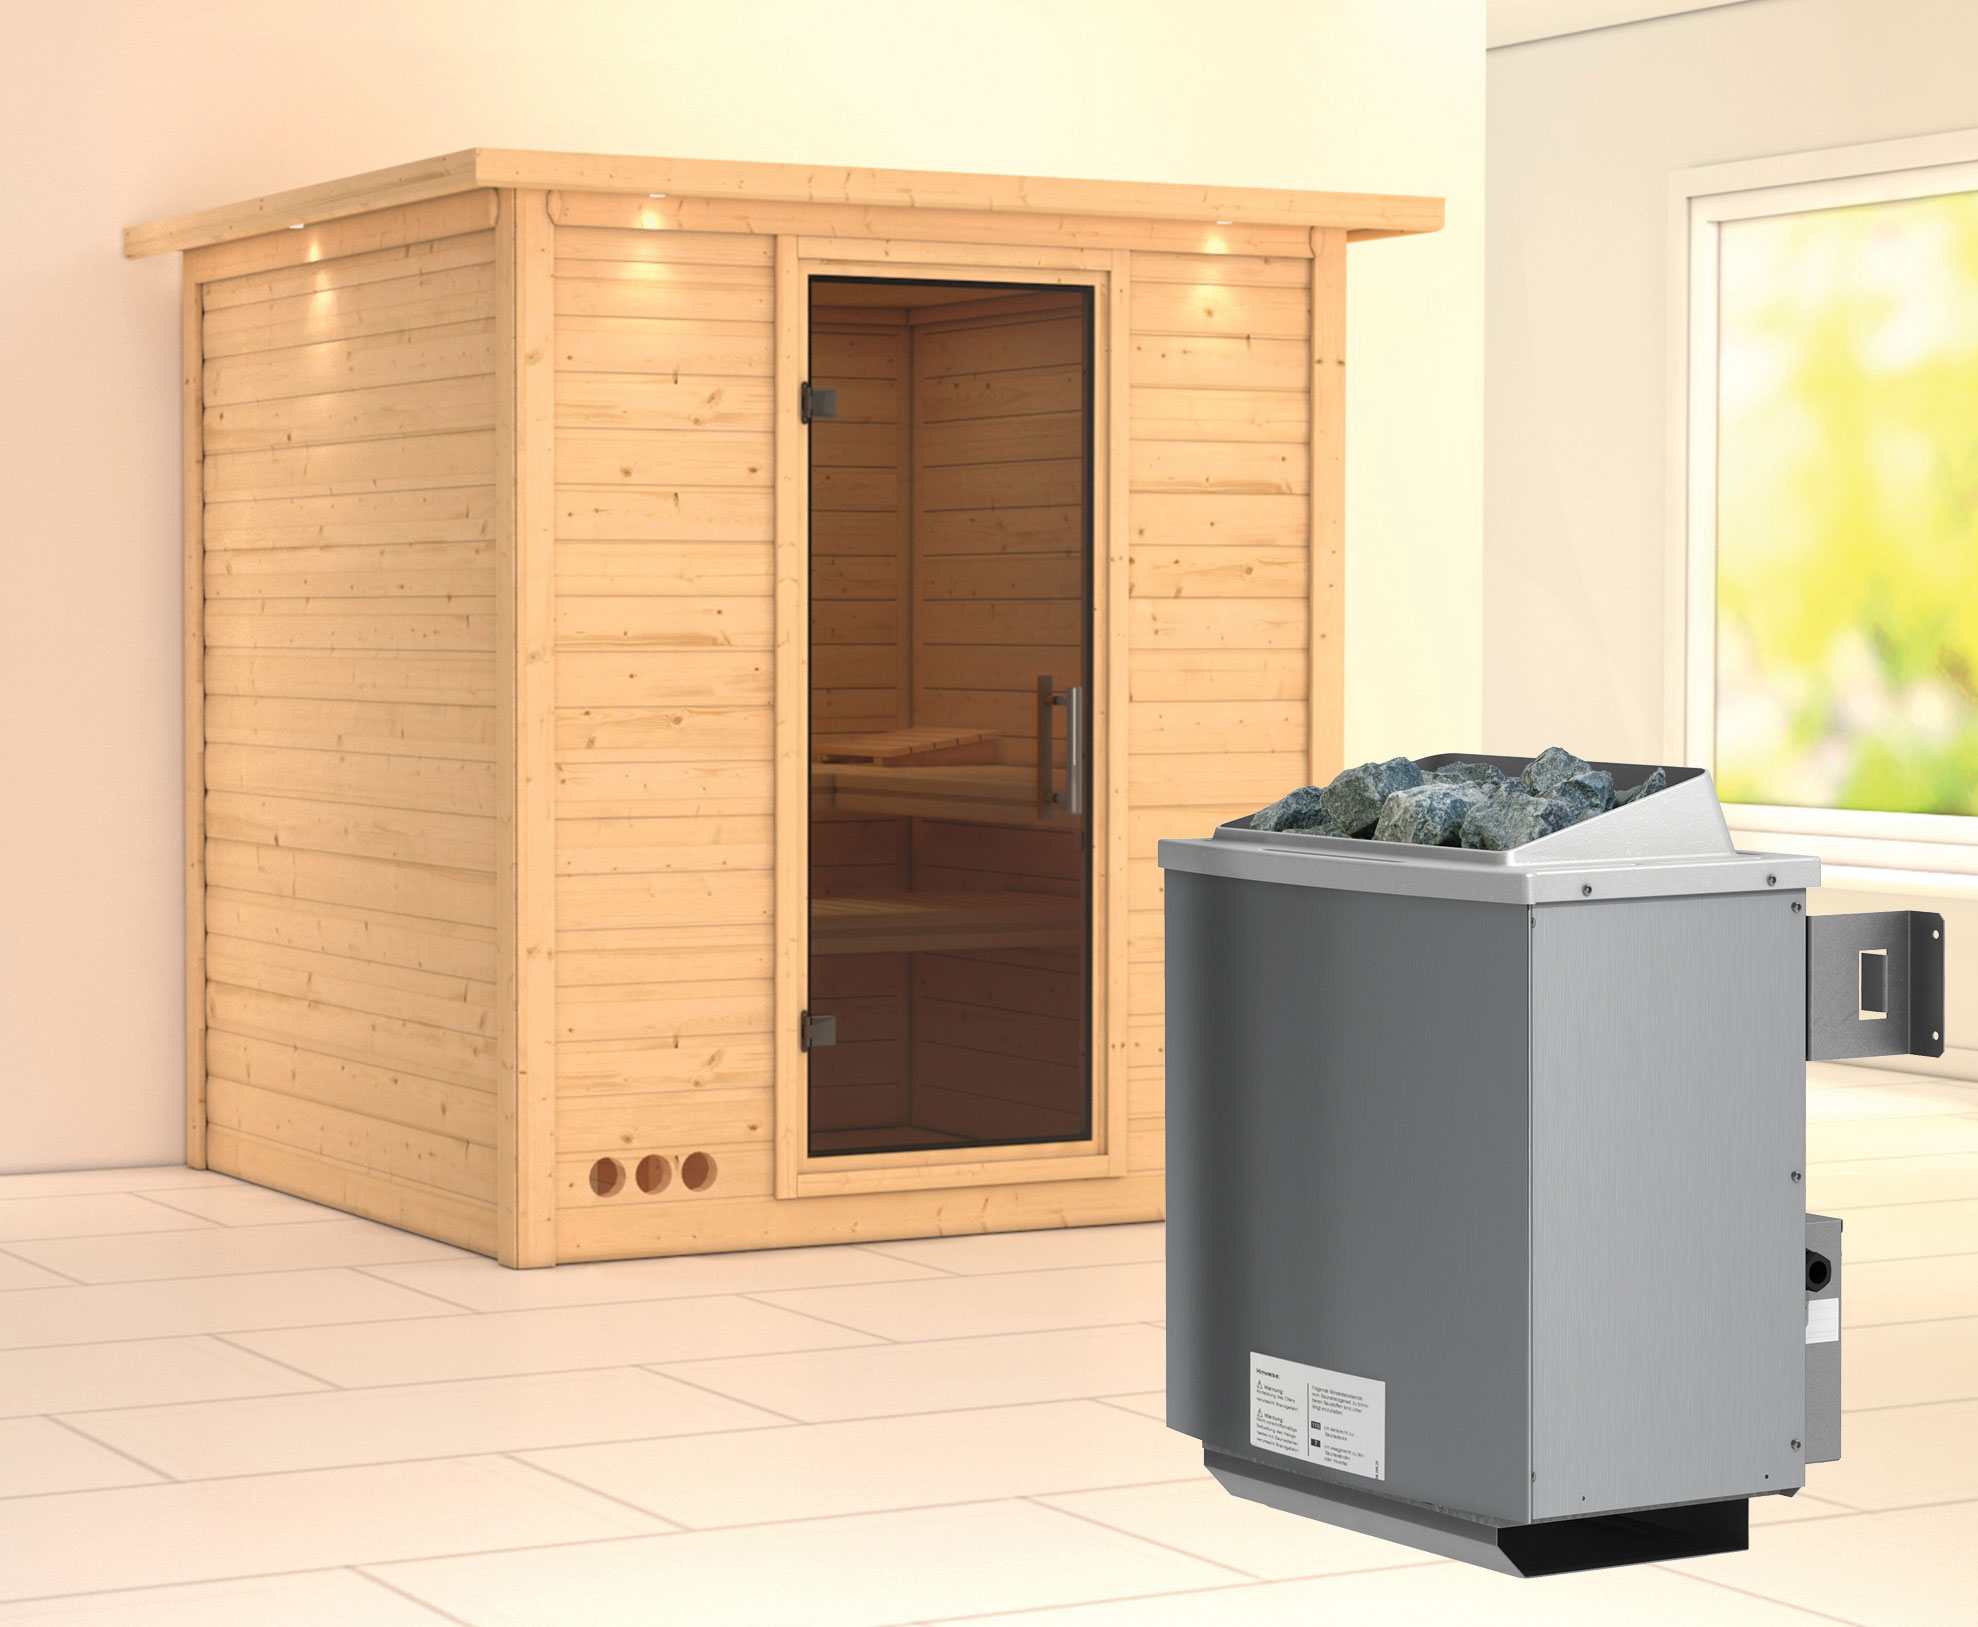 karibu sauna mojave modern mit dachkranz saunaofen 9kw. Black Bedroom Furniture Sets. Home Design Ideas